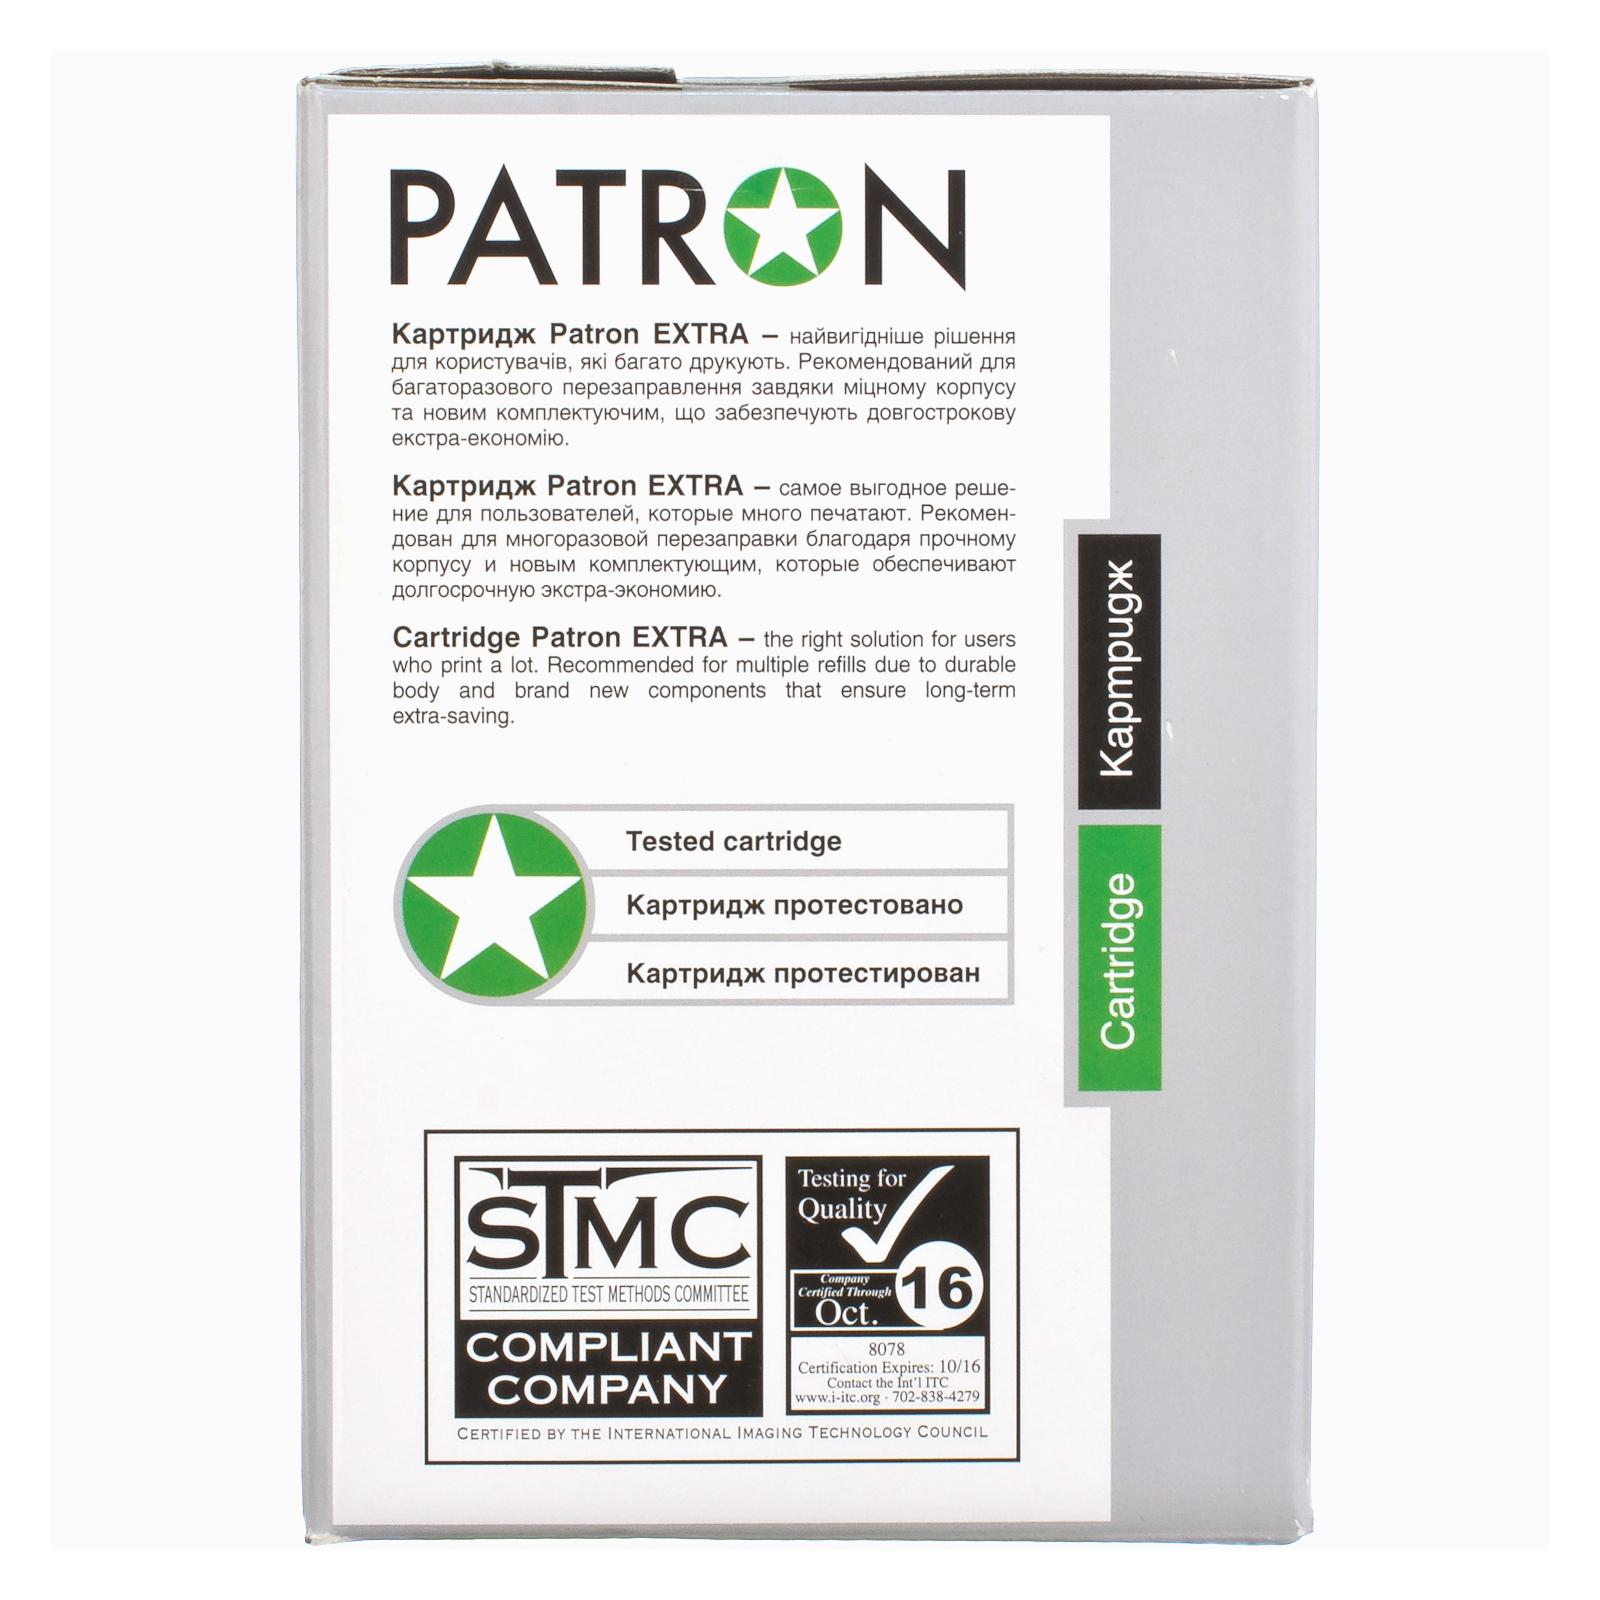 Картридж PATRON HP CLJ CP2025/ CM2320 (PN-304ACR) CYAN Extra (CT-HP-CC531A-C-PN-R) изображение 6